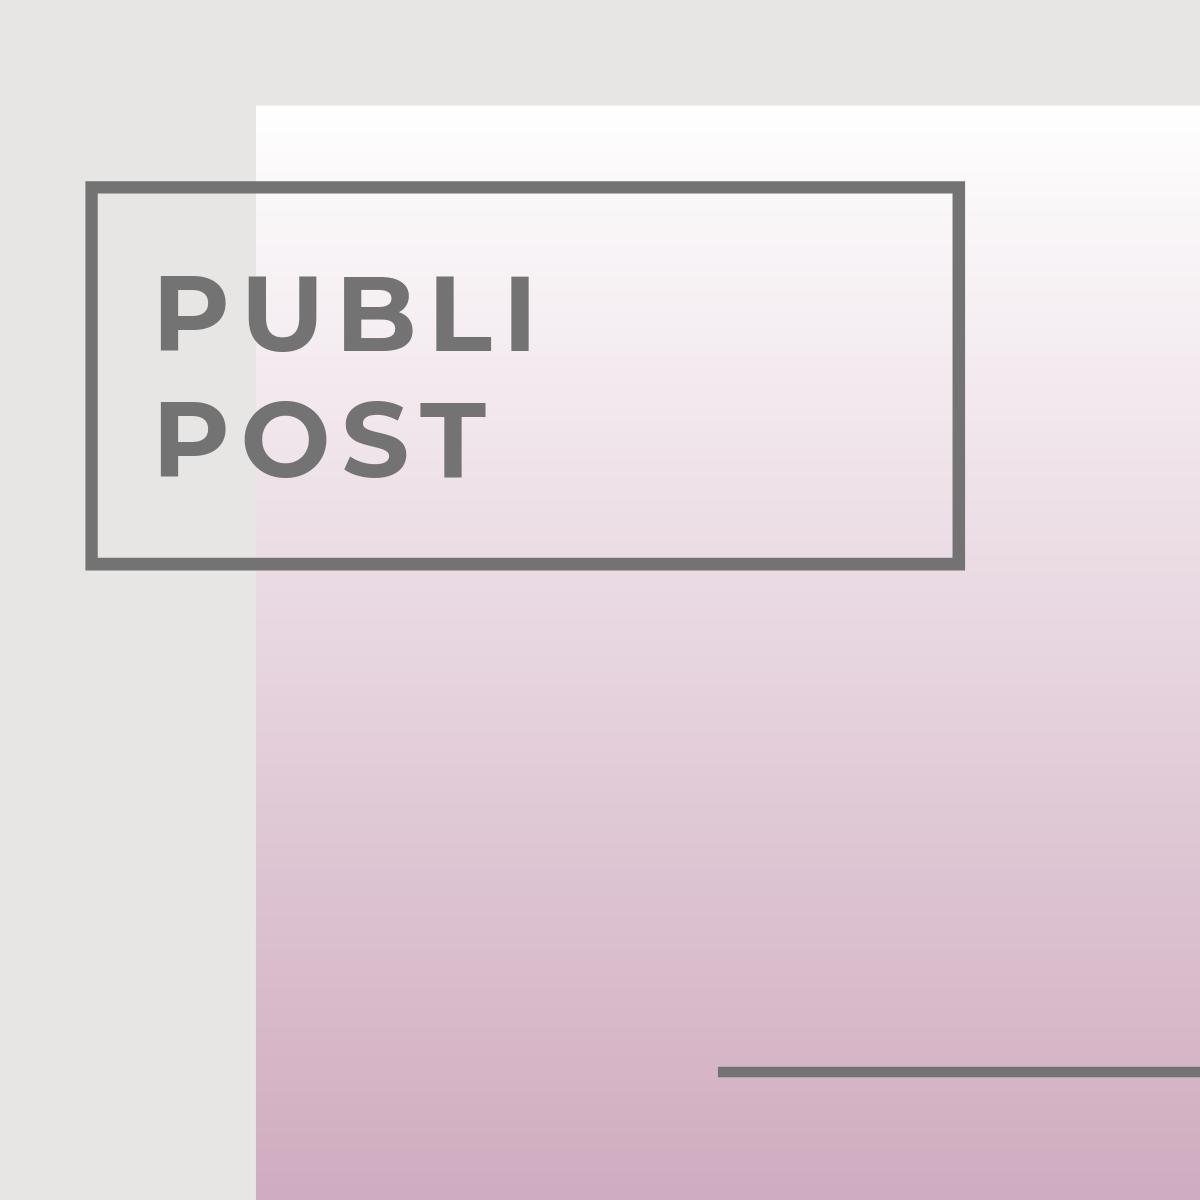 publi post